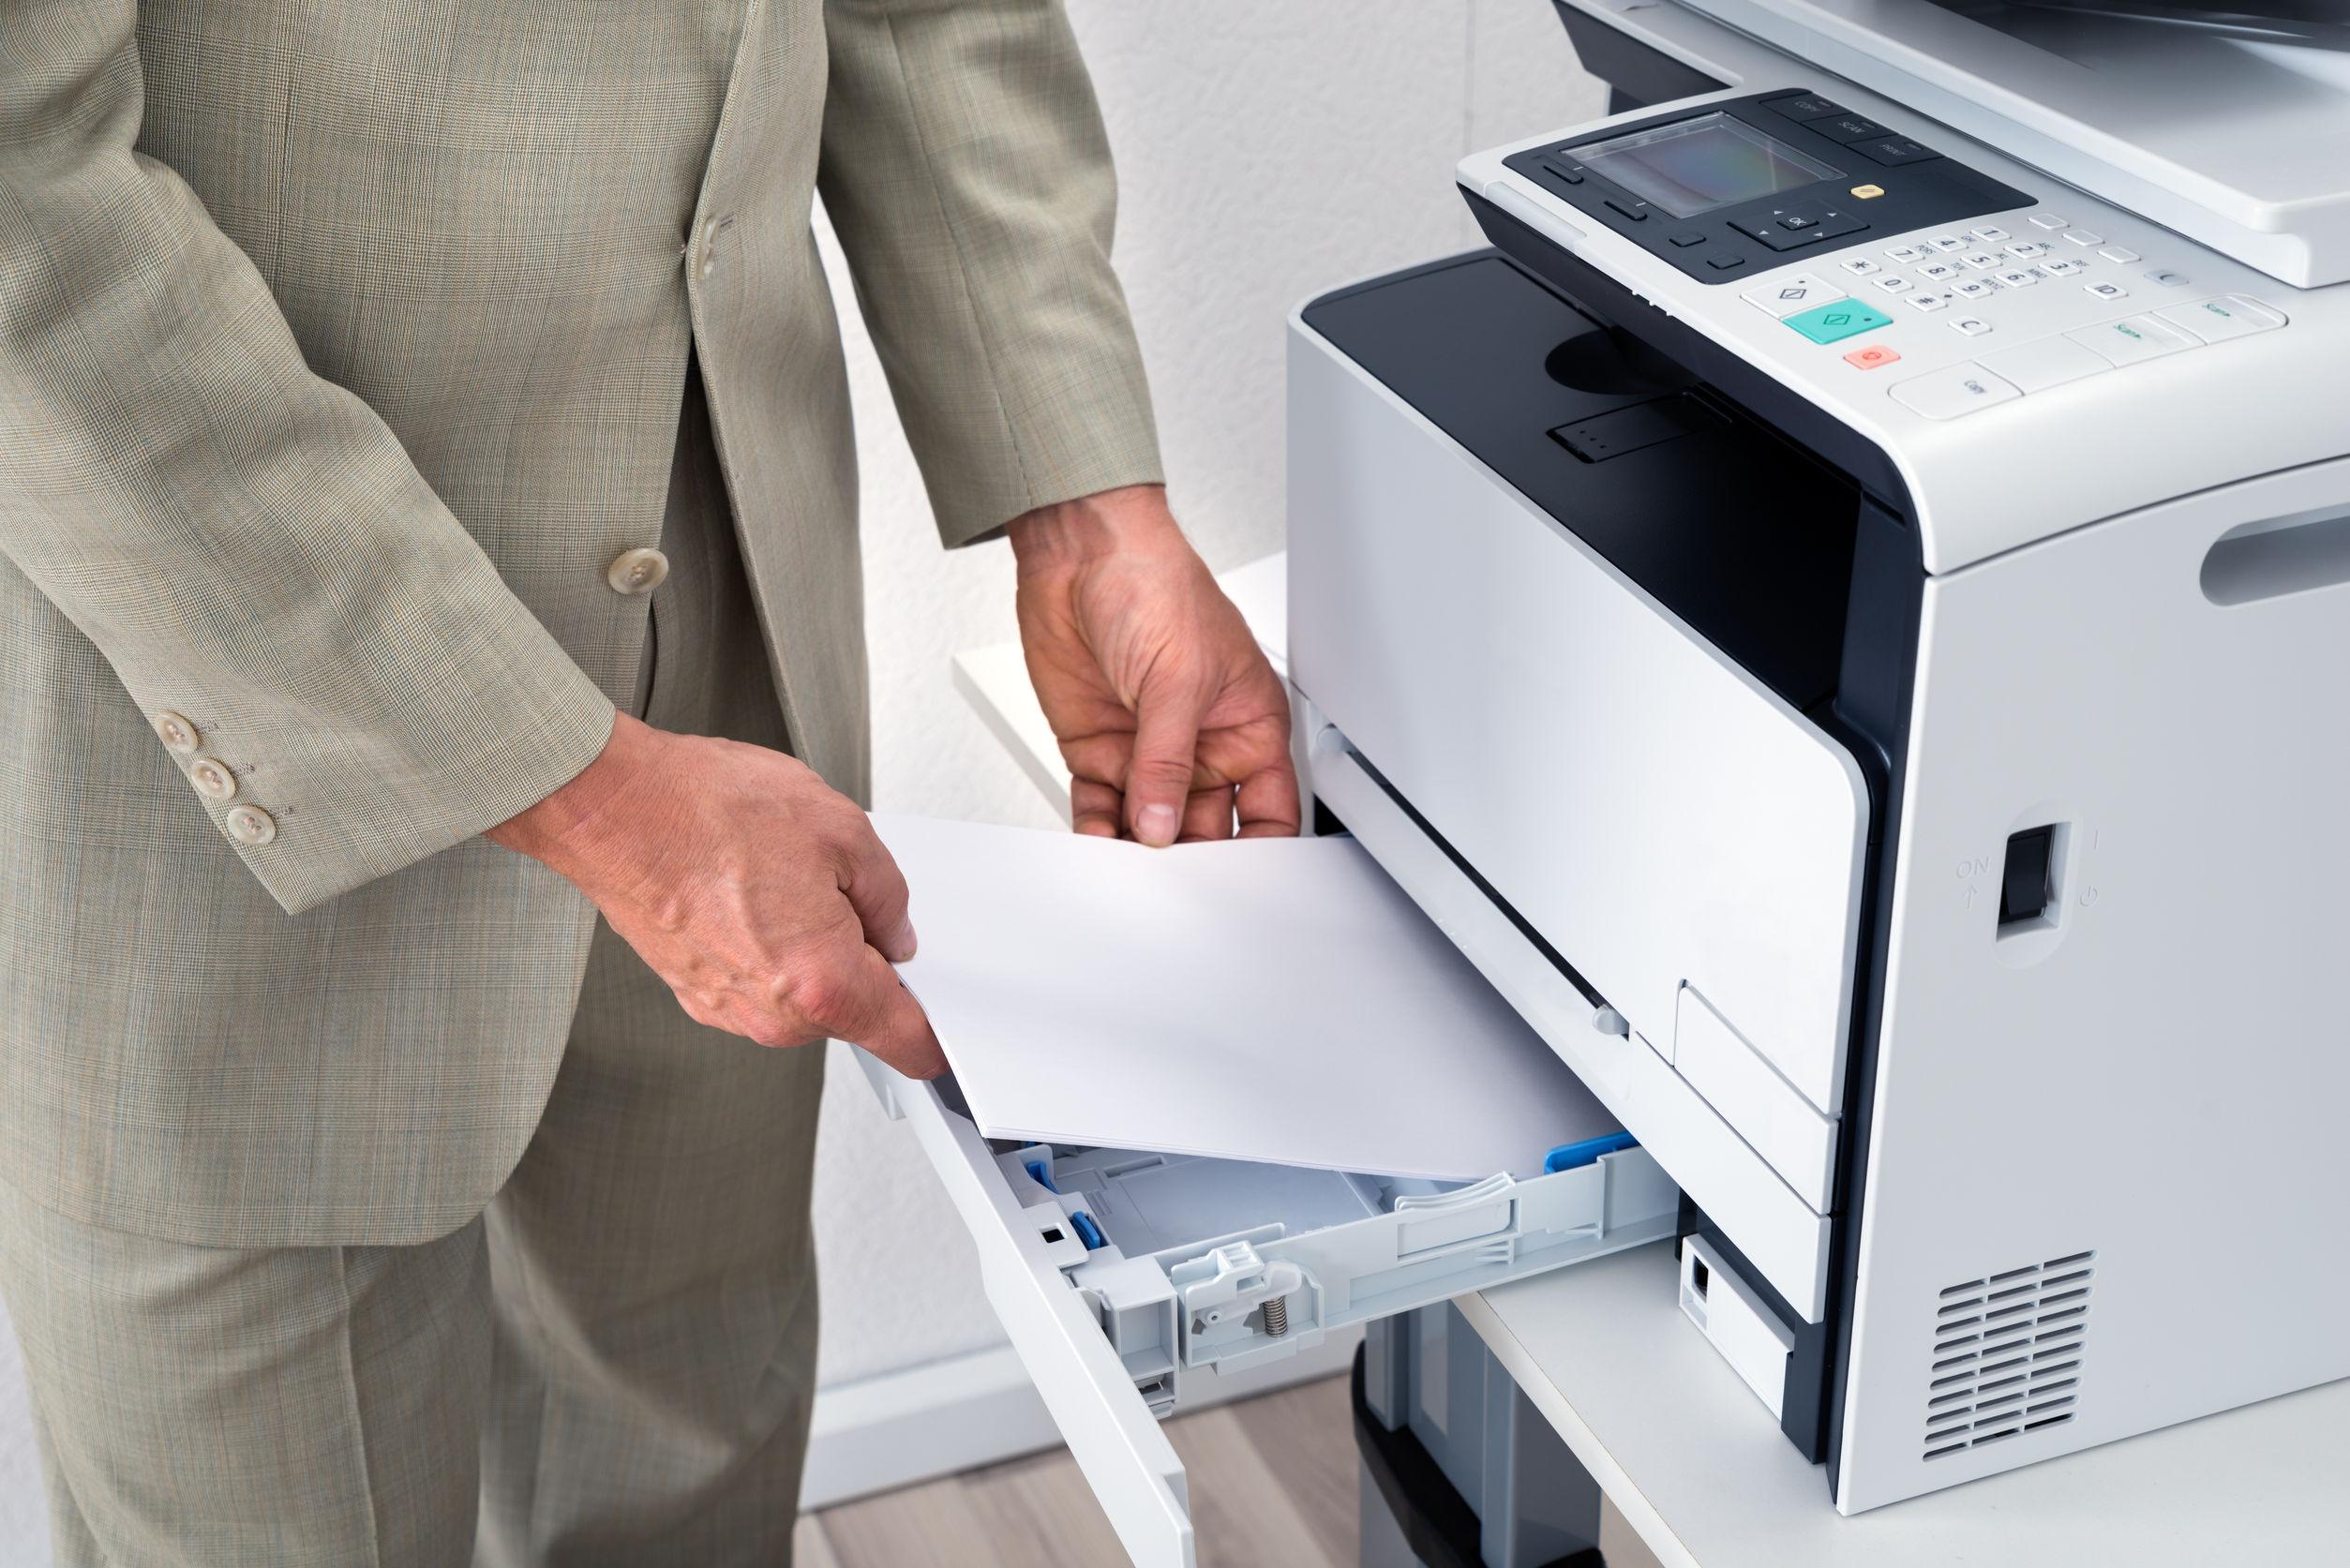 Negotiate a Copier Lease